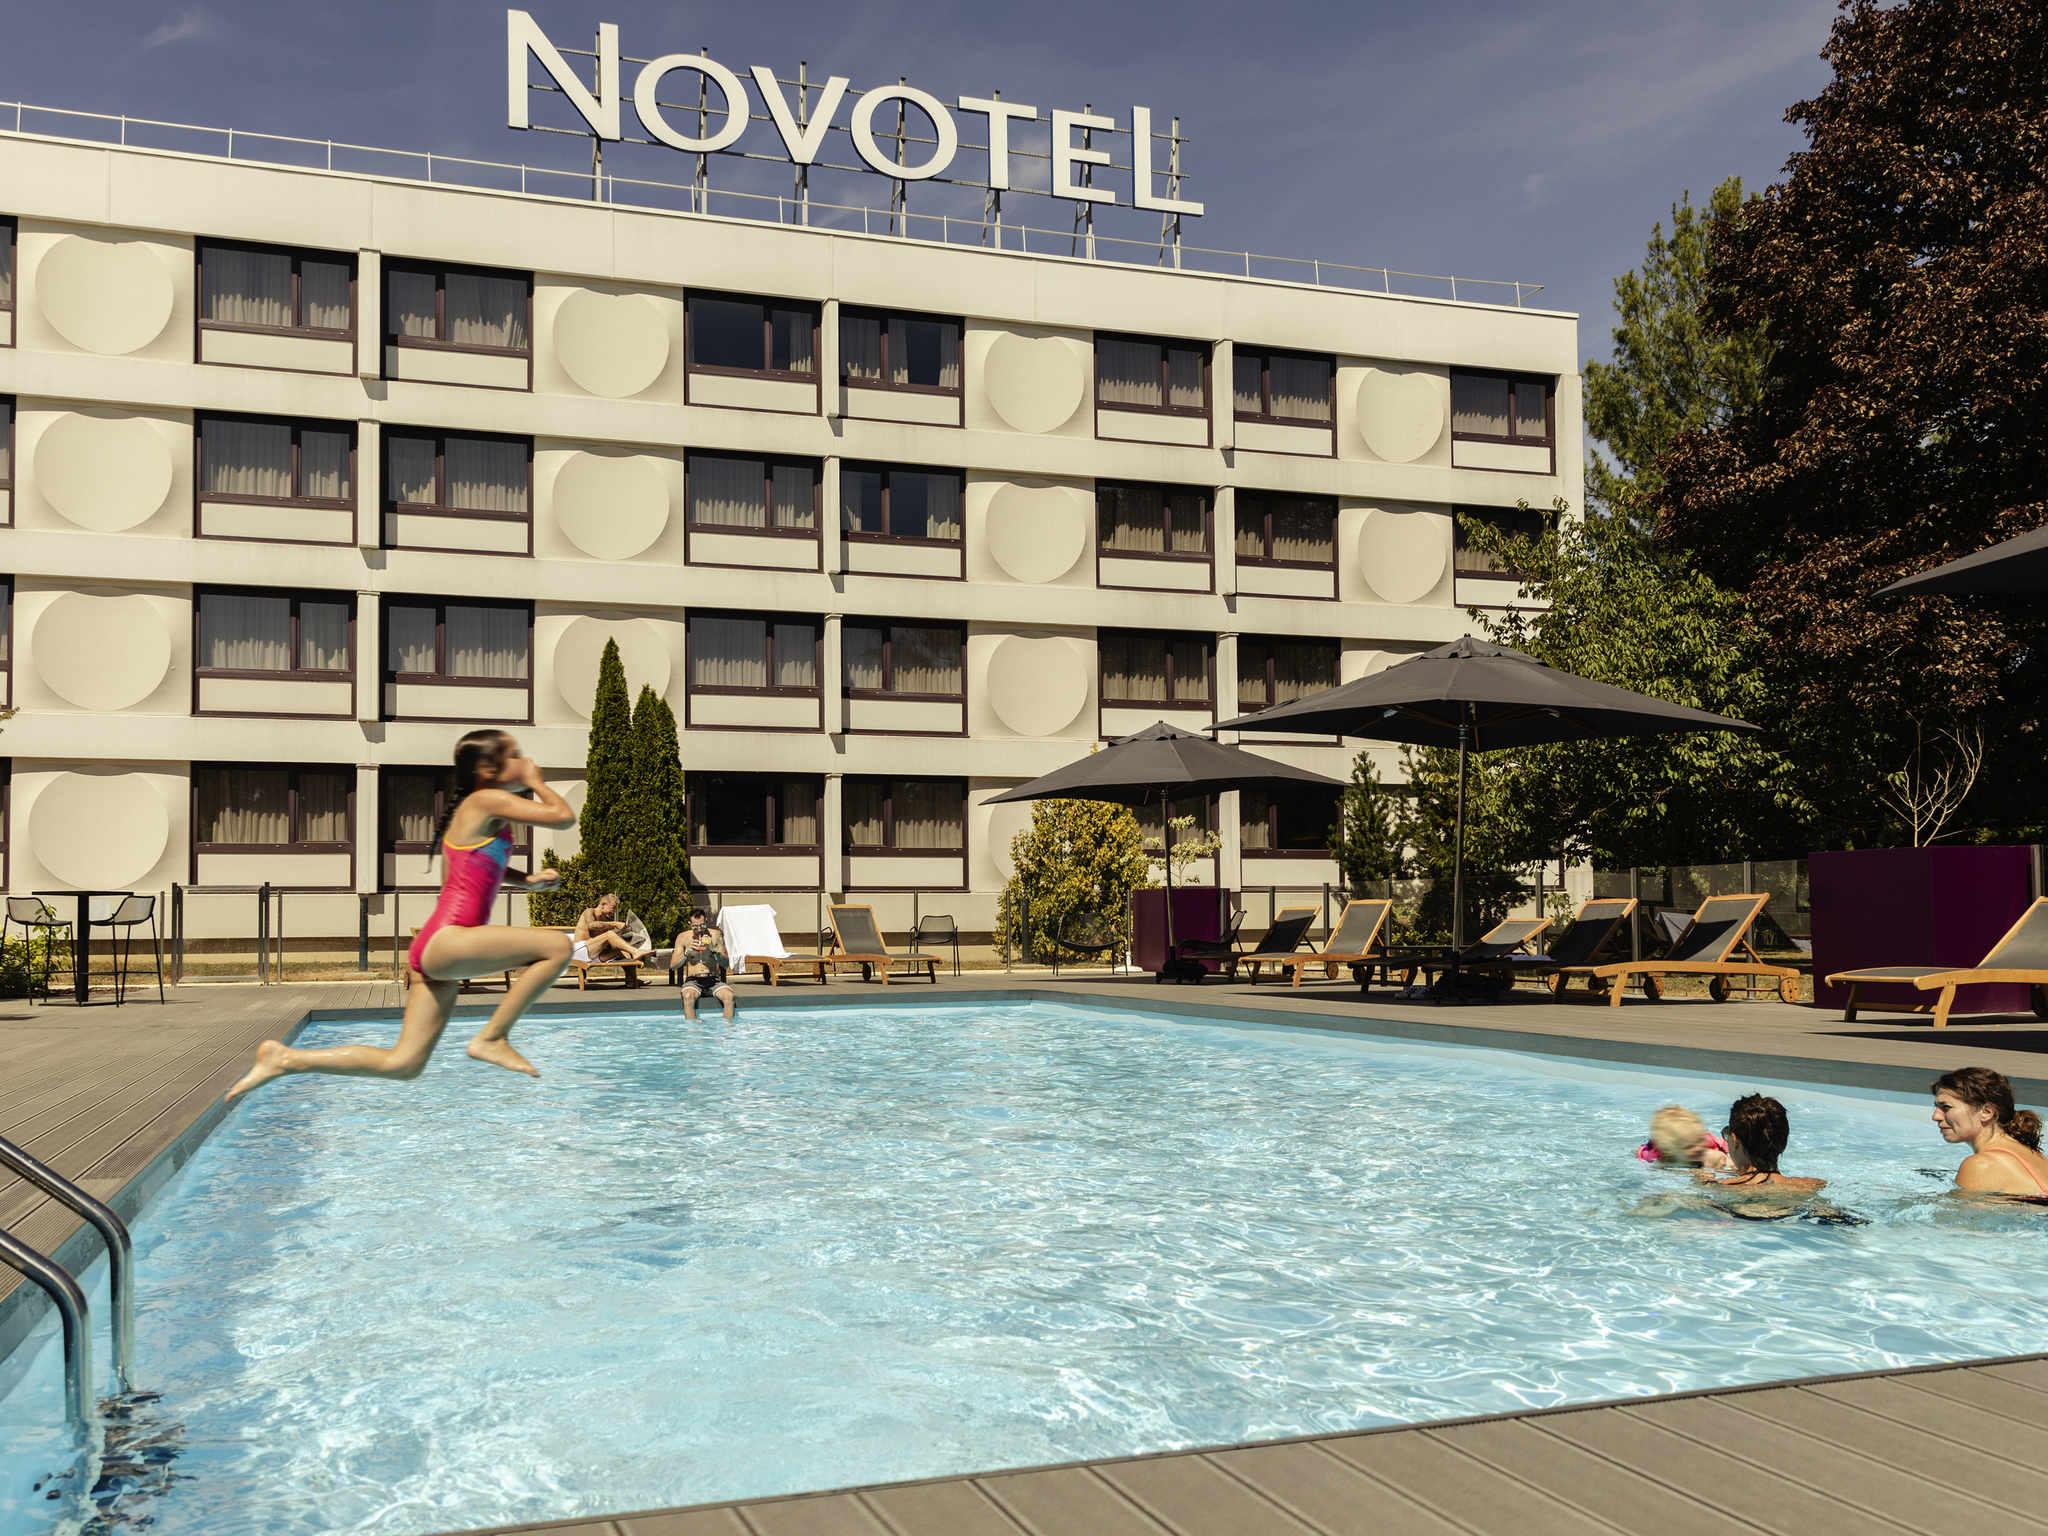 Hôtel - Novotel Nancy